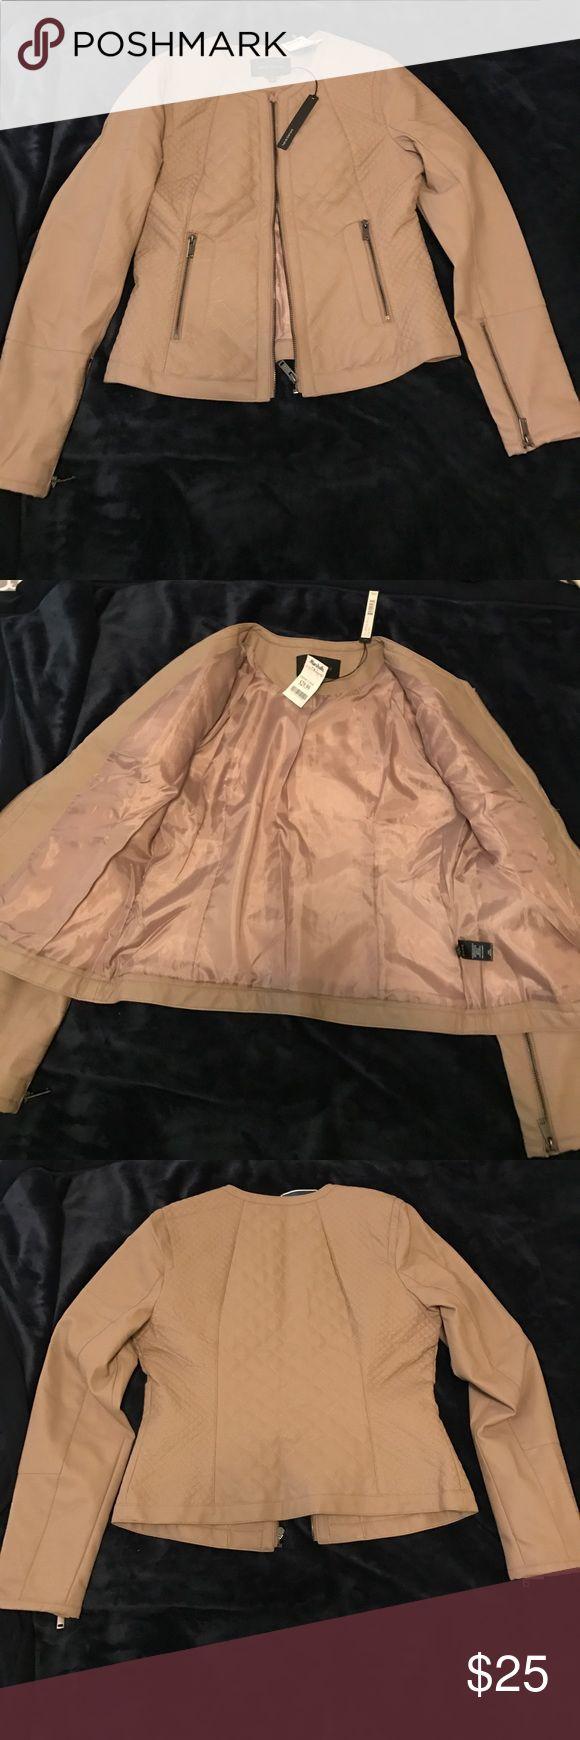 Tan leather jacket Harve benard brand tan leather jacket Harve Benard Jackets & Coats